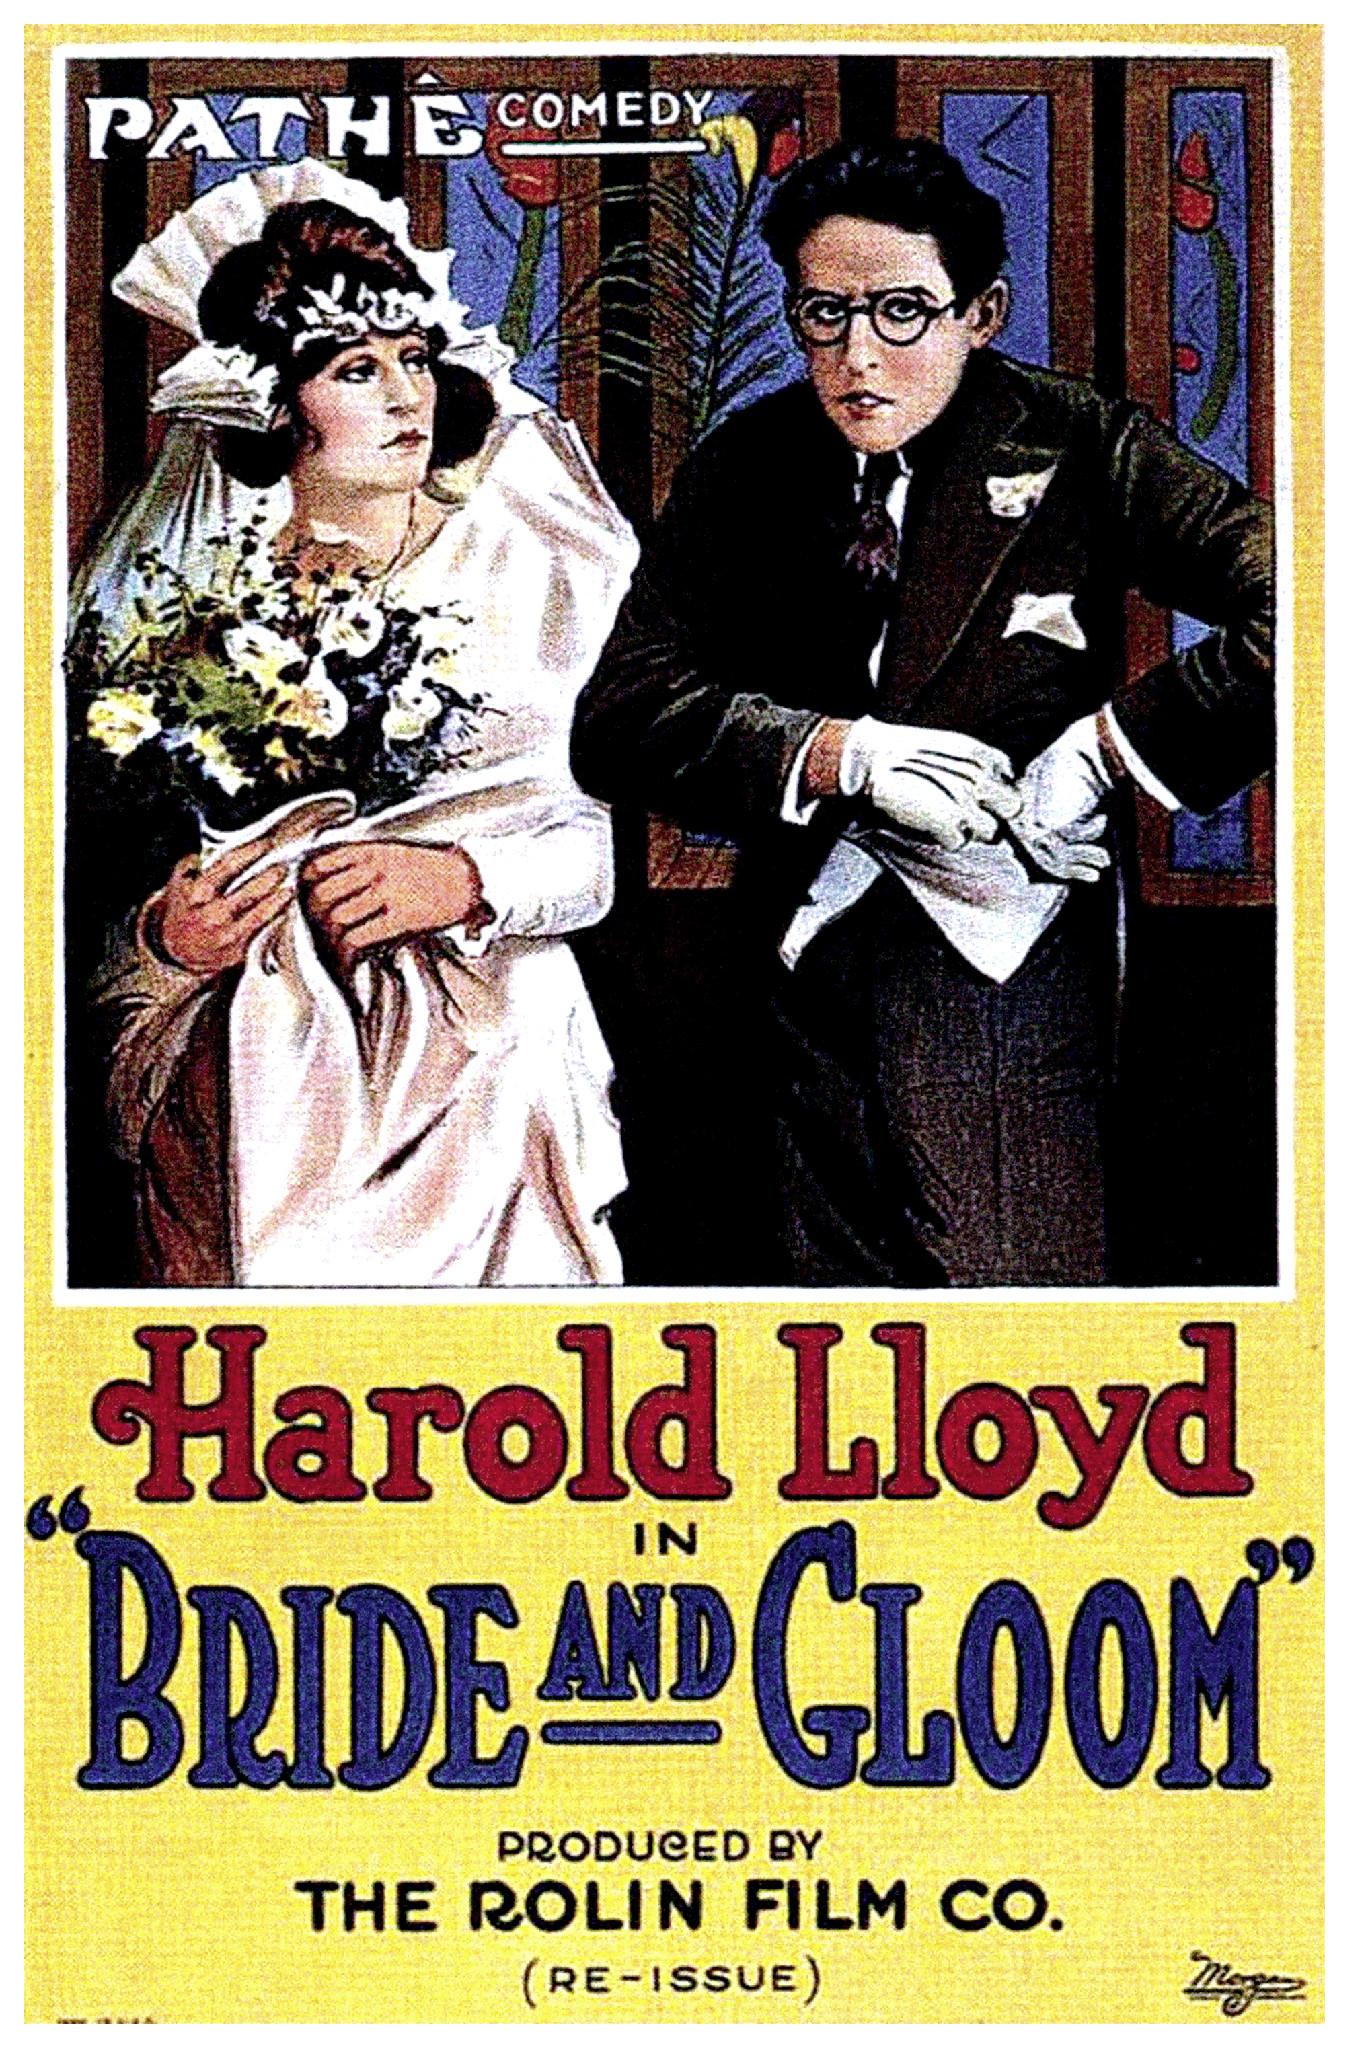 Bride_and_Gloom_(film)